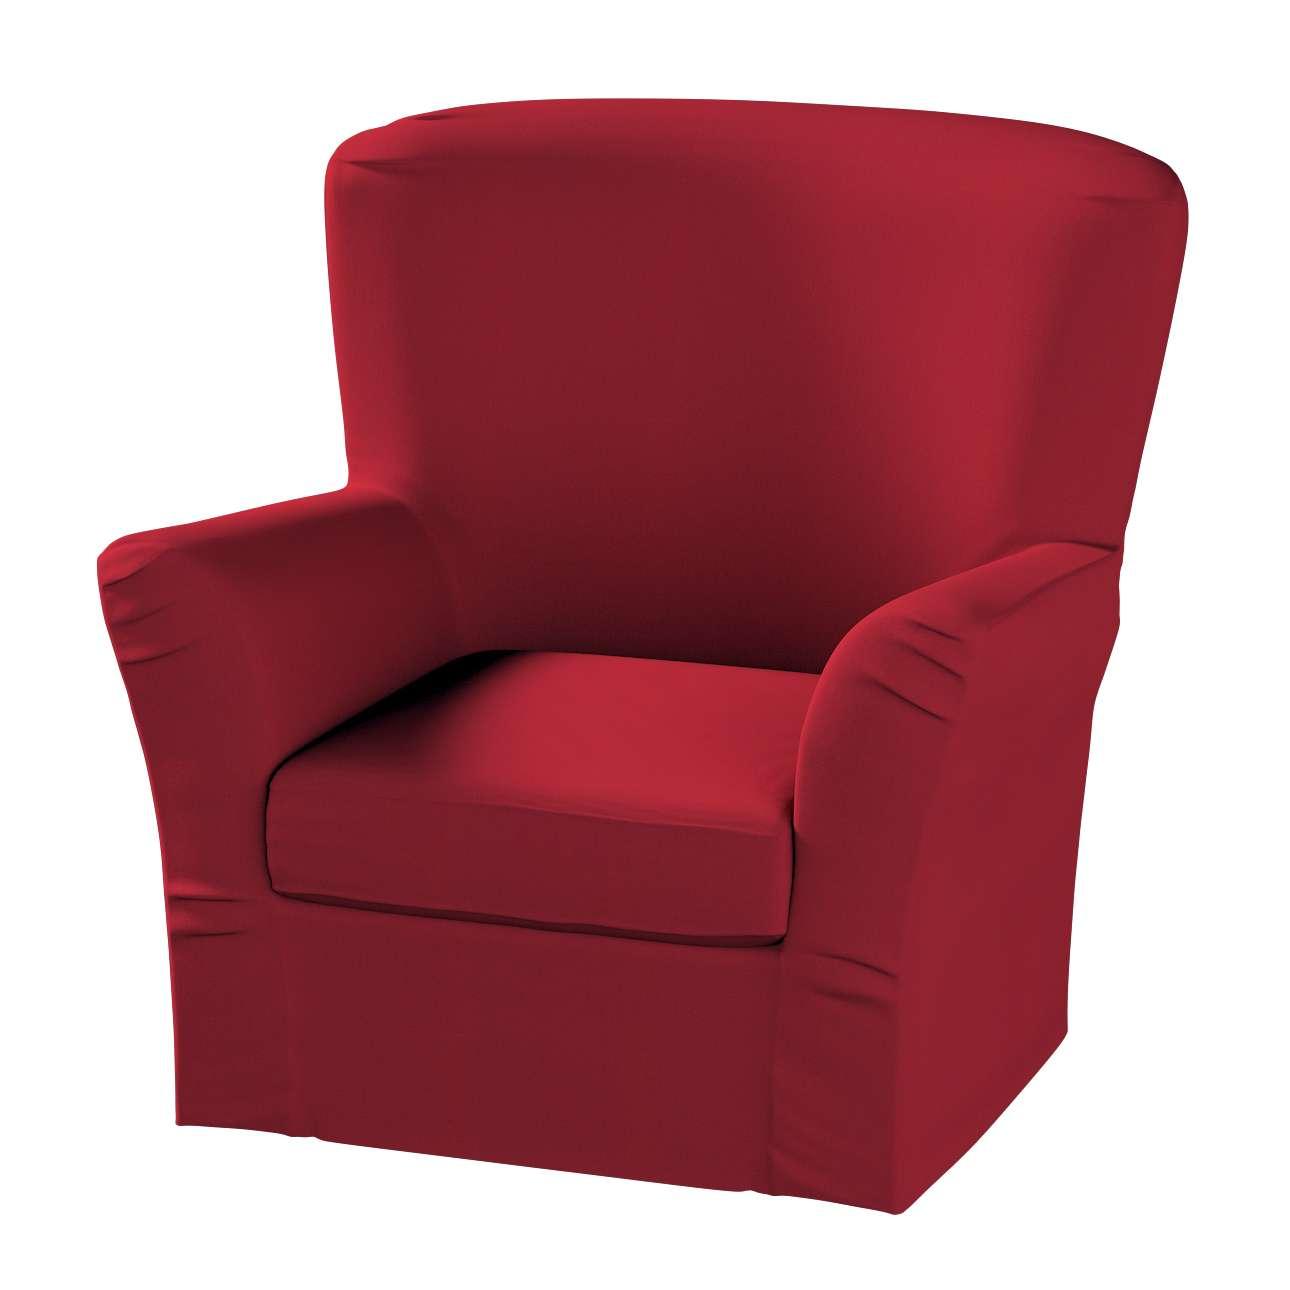 TOMELILLA fotelio užvalkalas TOMELILLA fotelis kolekcijoje Chenille, audinys: 702-24